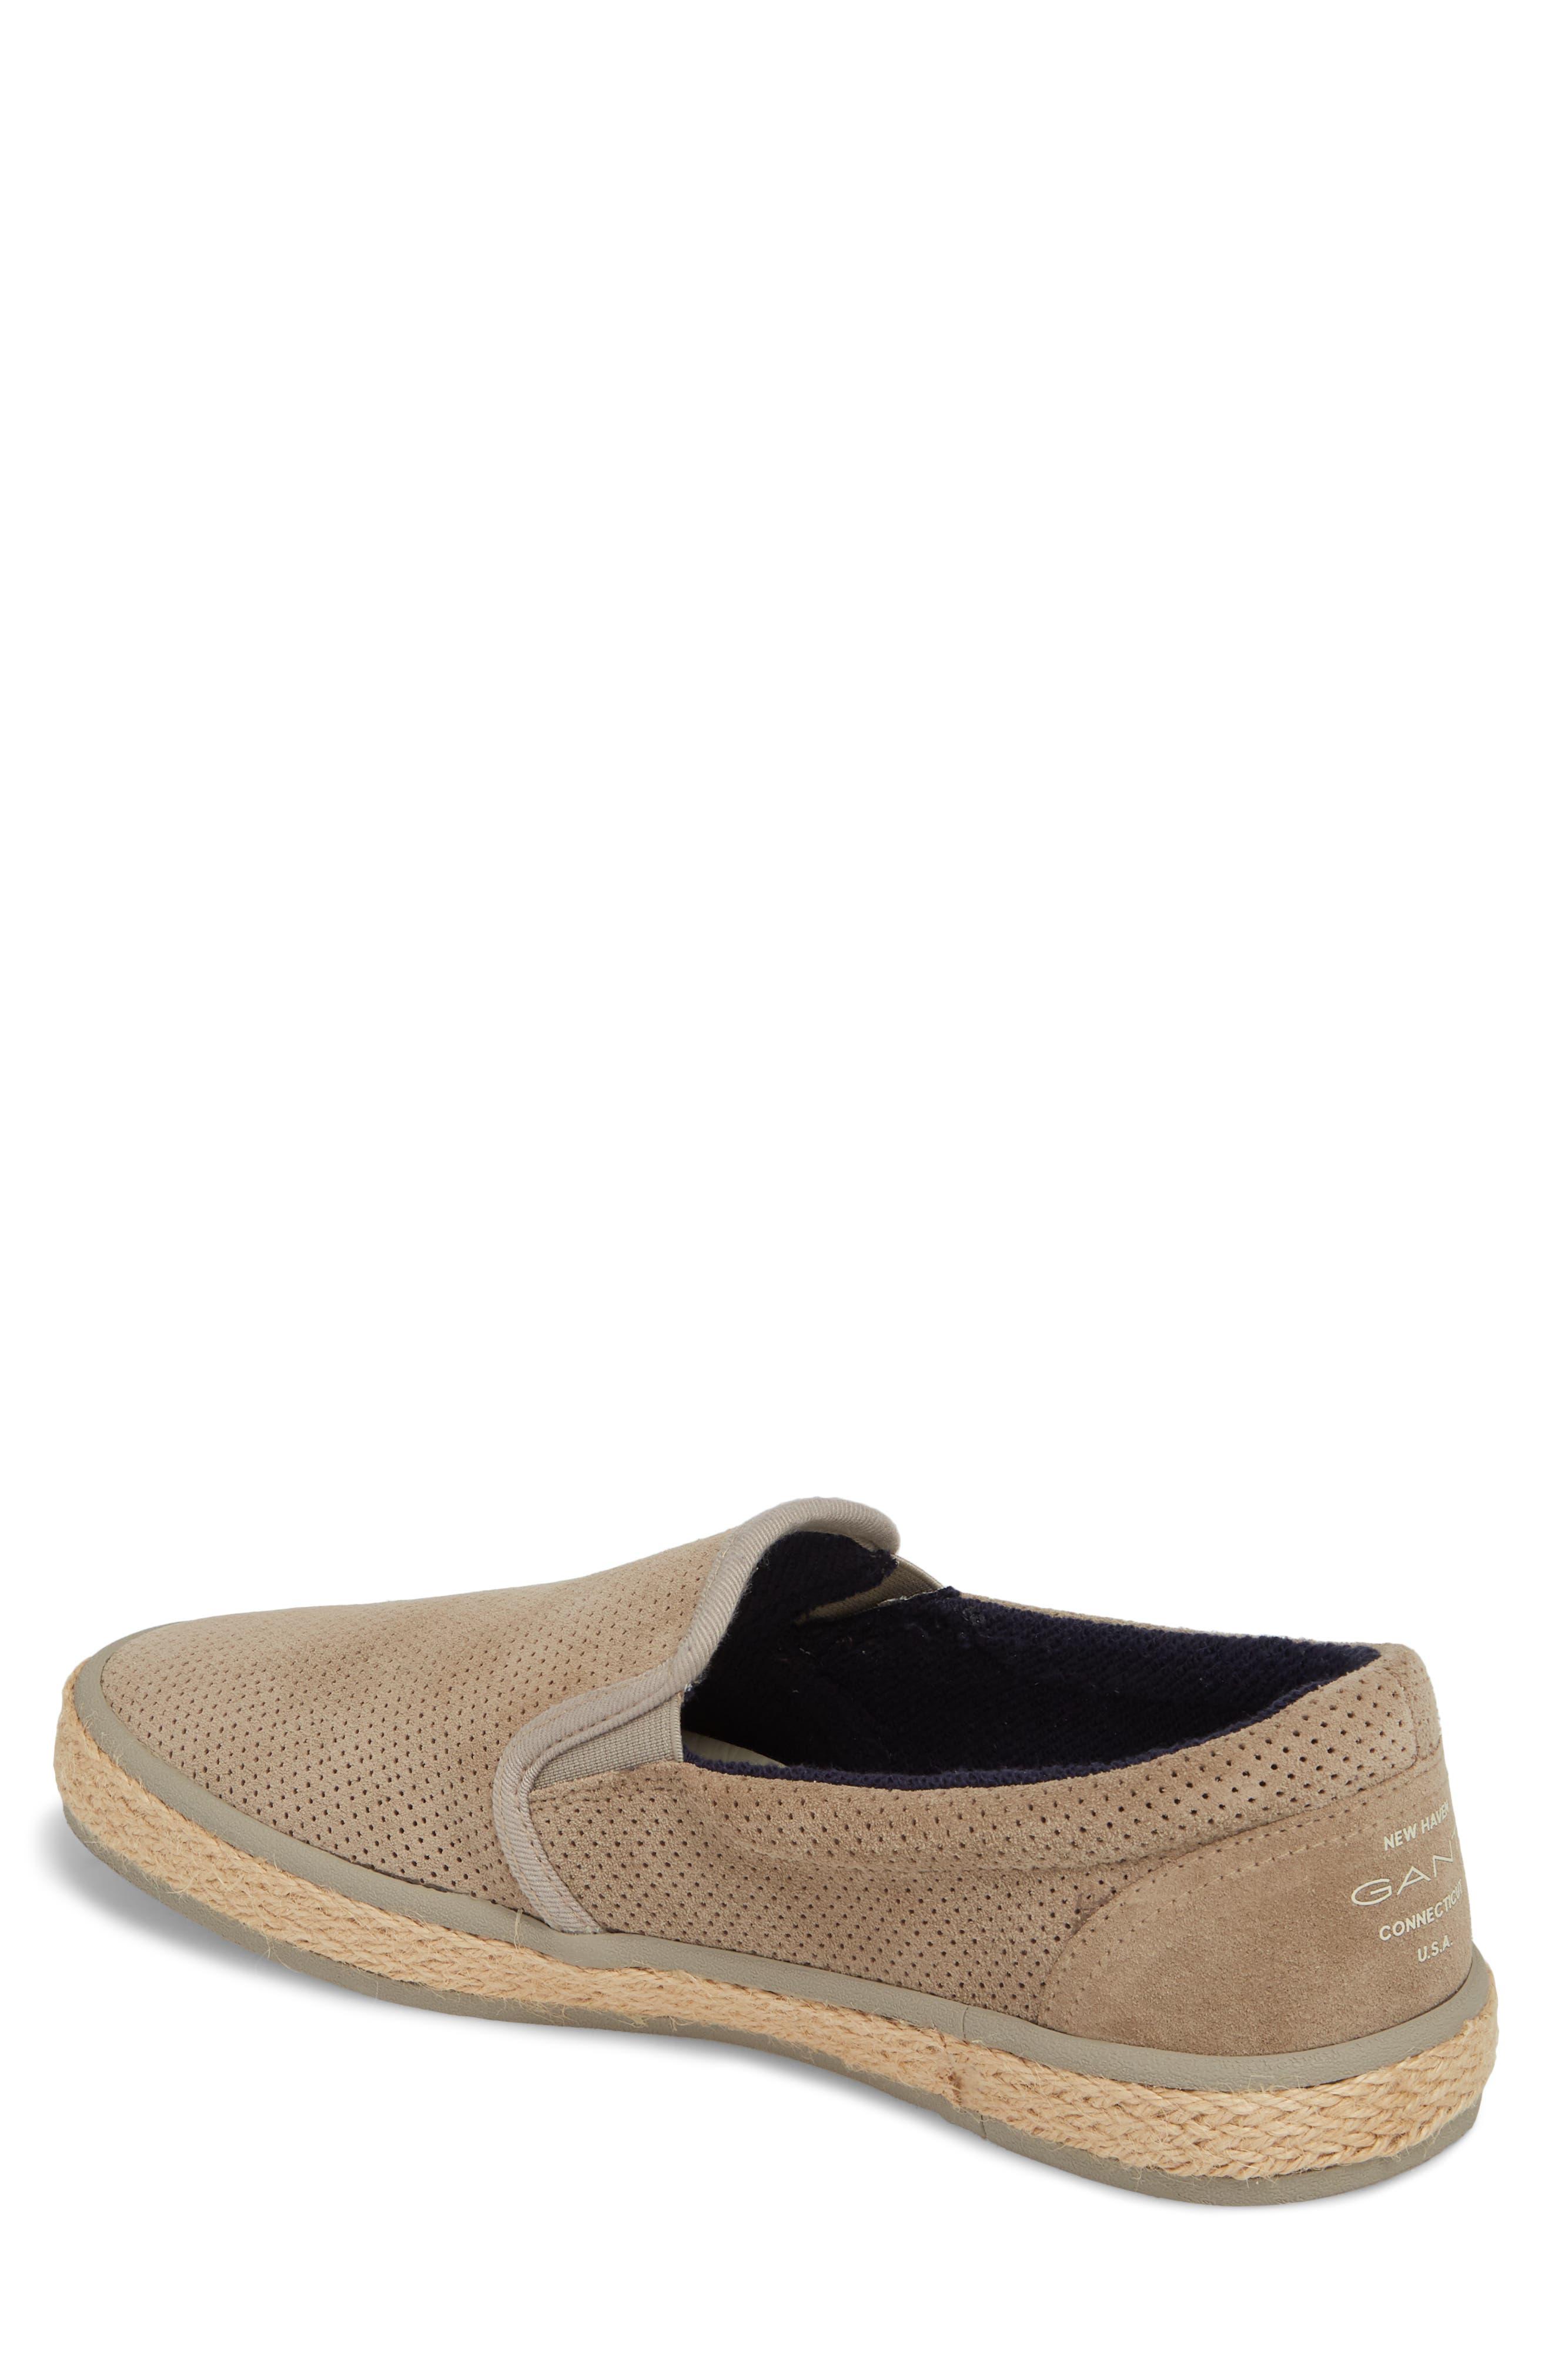 Master Perforated Slip-On Sneaker,                             Alternate thumbnail 2, color,                             209